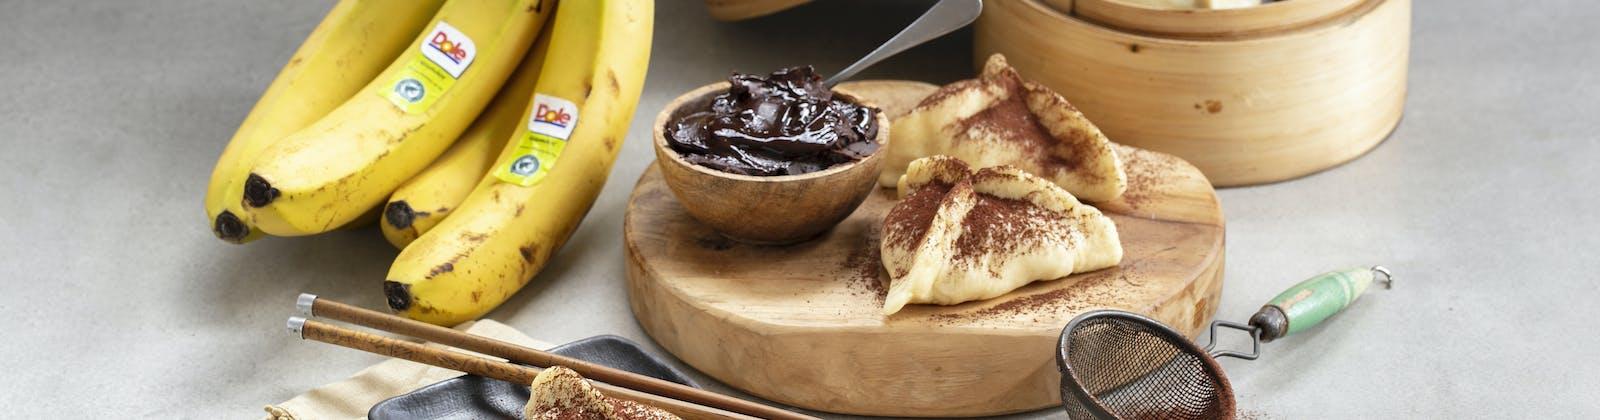 chocolate and banana dumplings